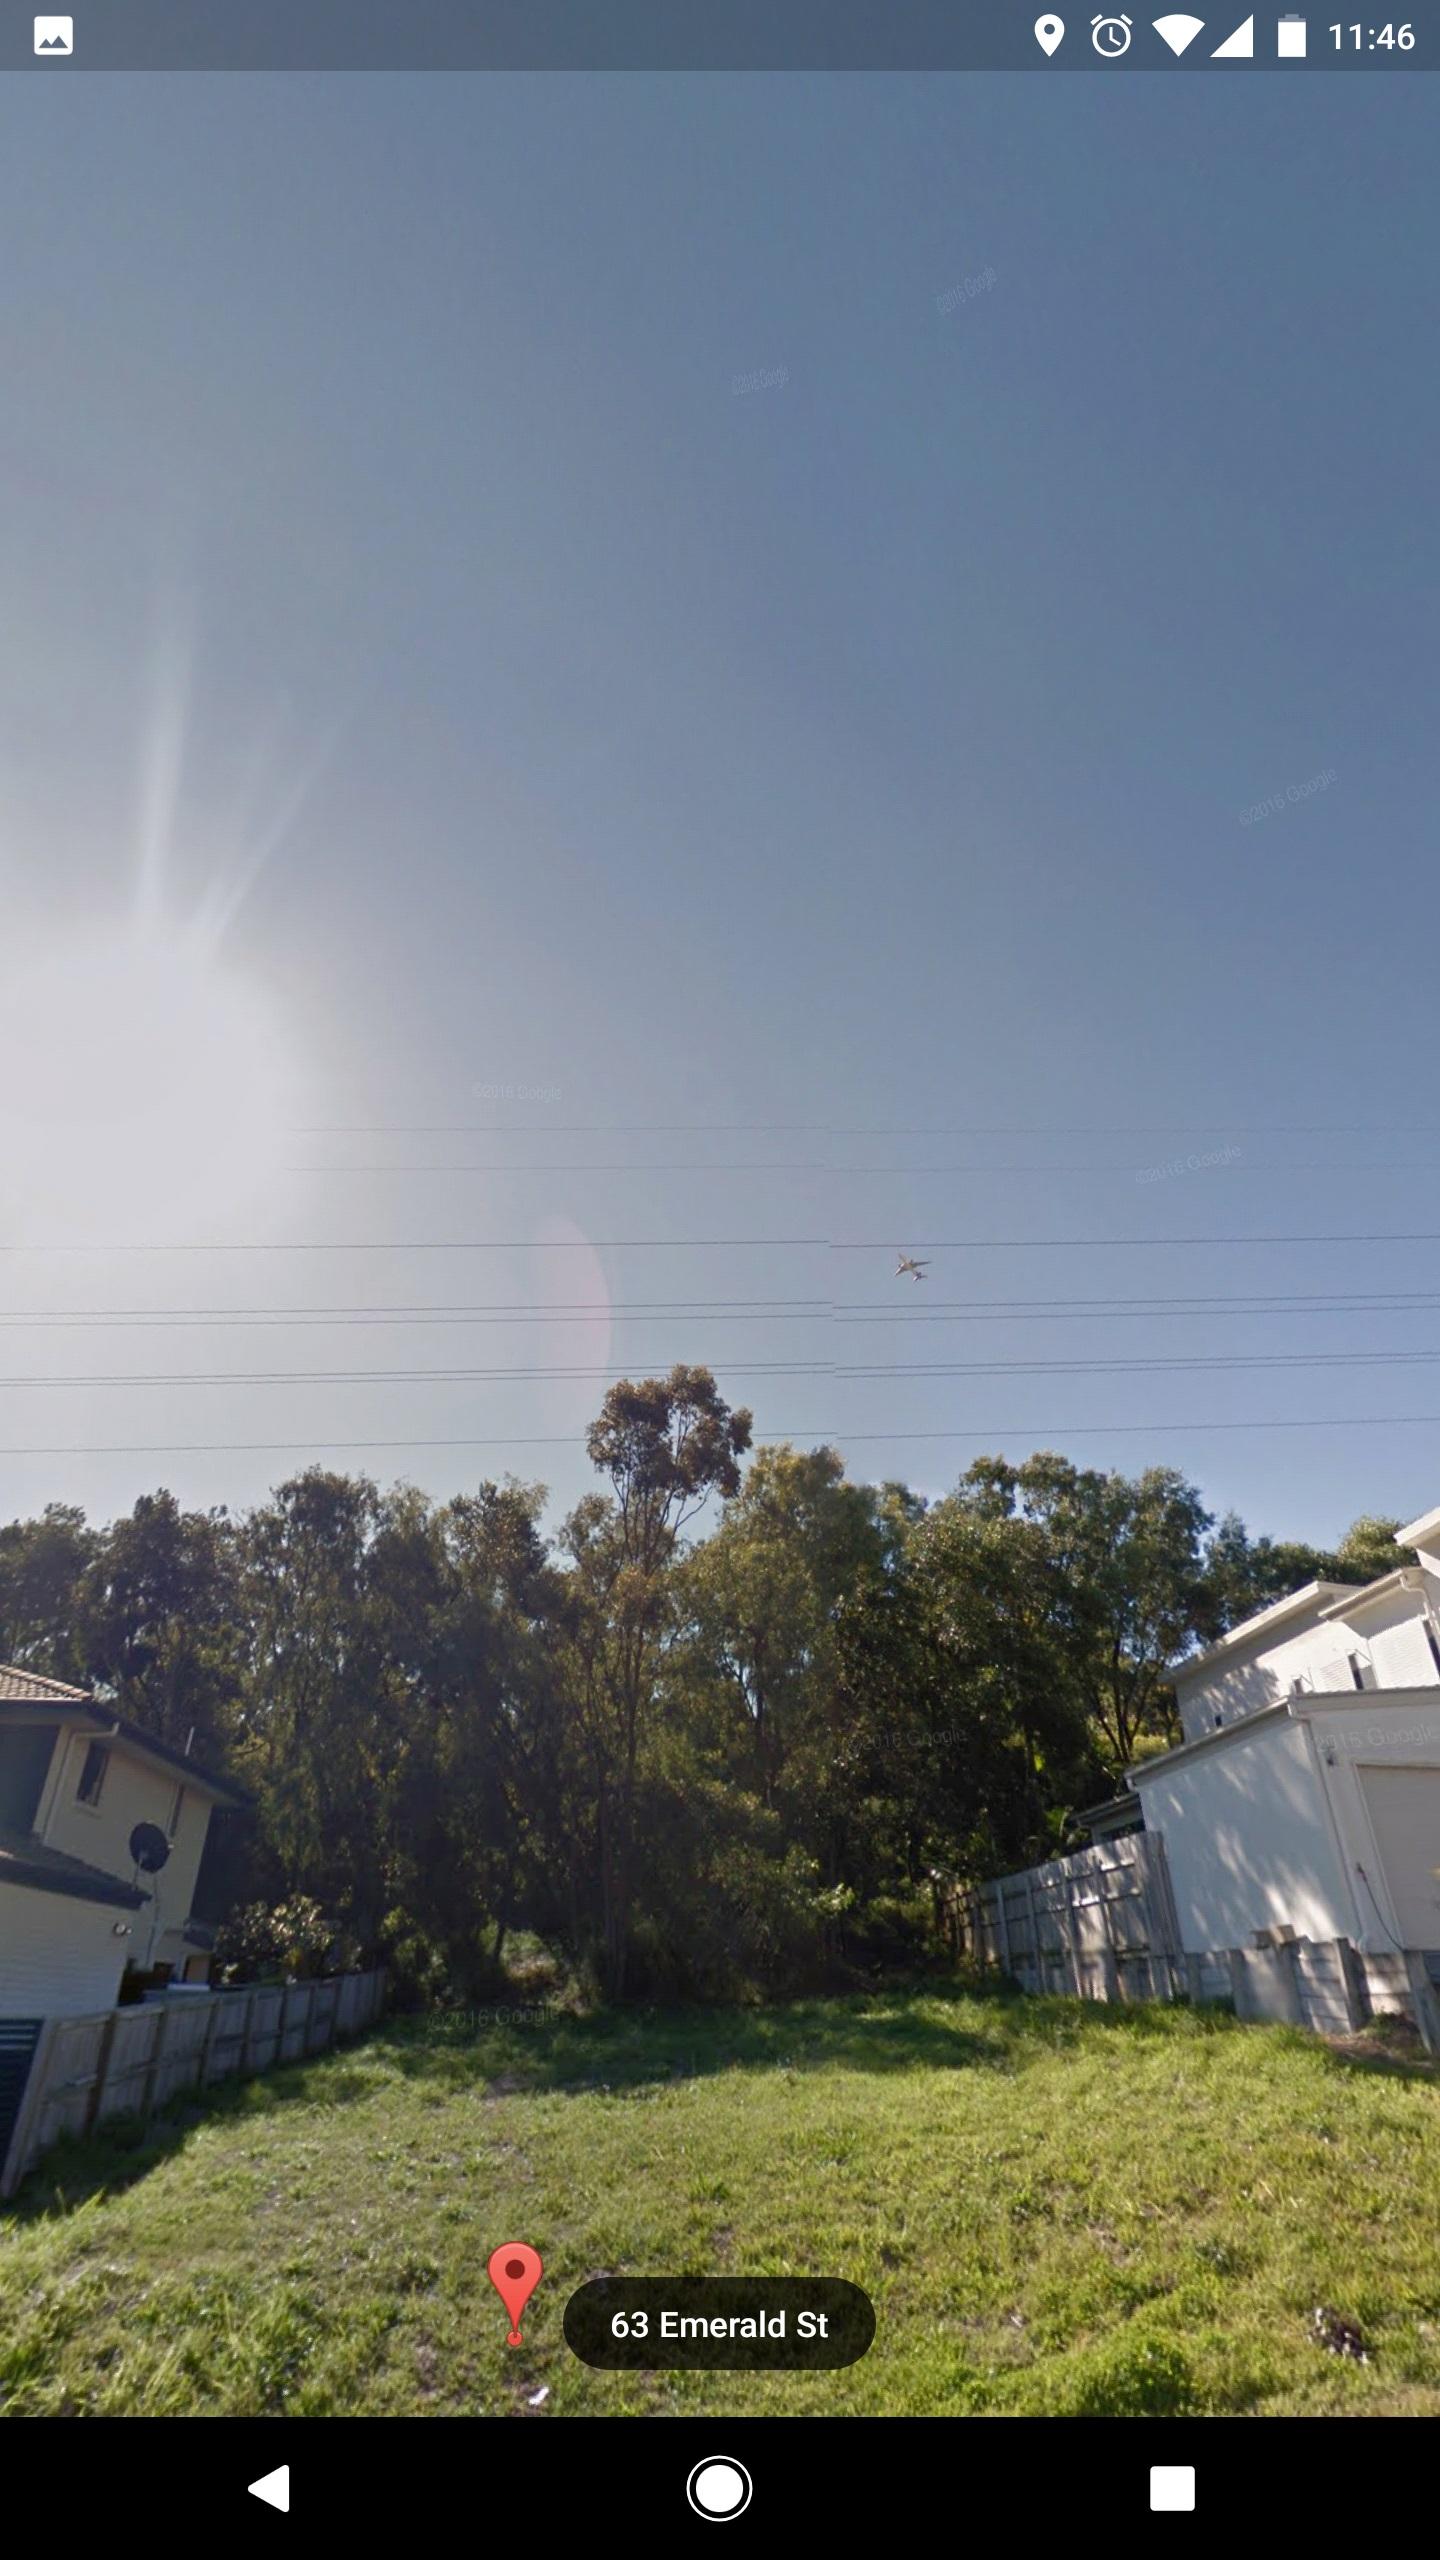 Vacant Land – 63 Emerald Street, Murarrie QLD 4172 Brisbane, Australia.